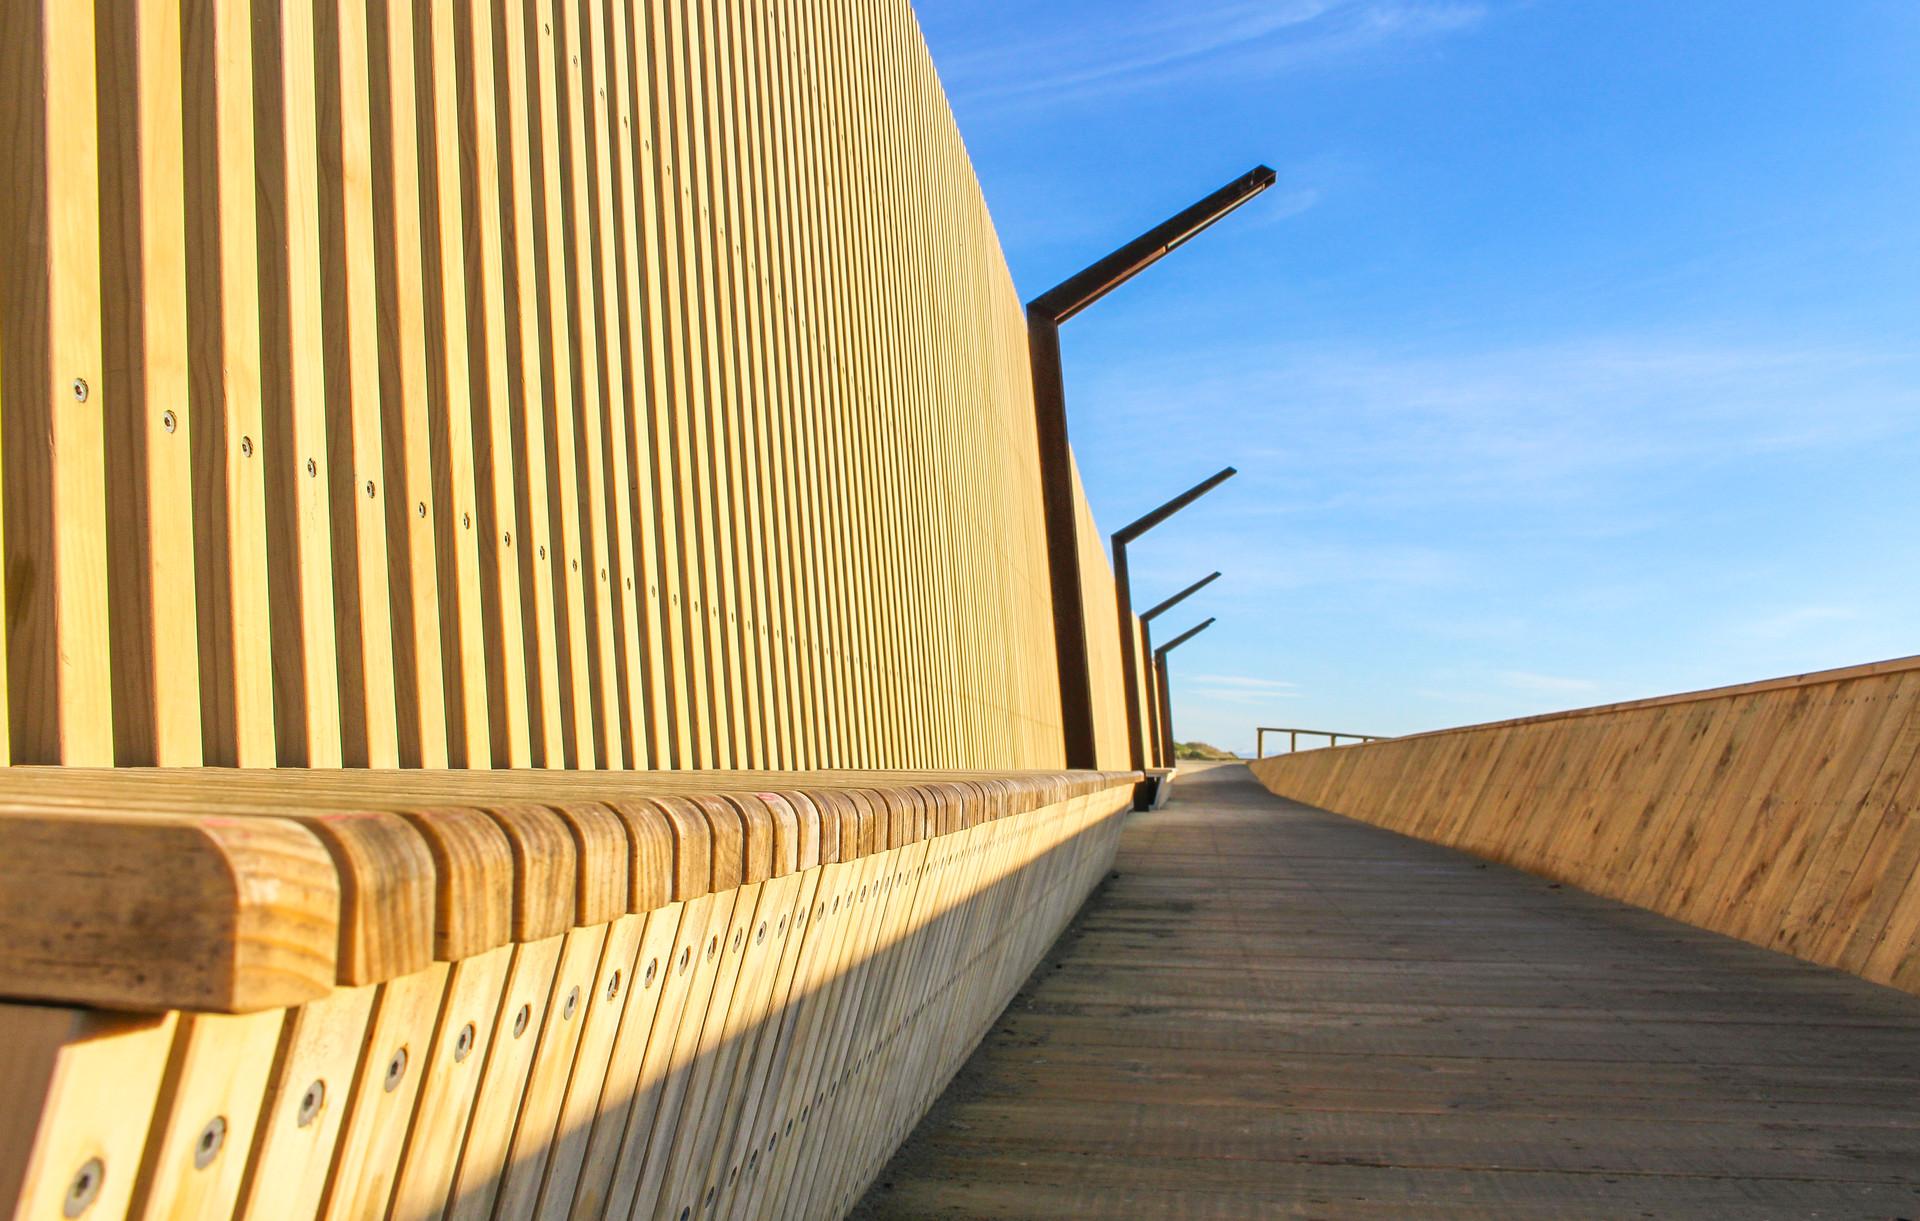 New-brighton-bench-design-boardwalk